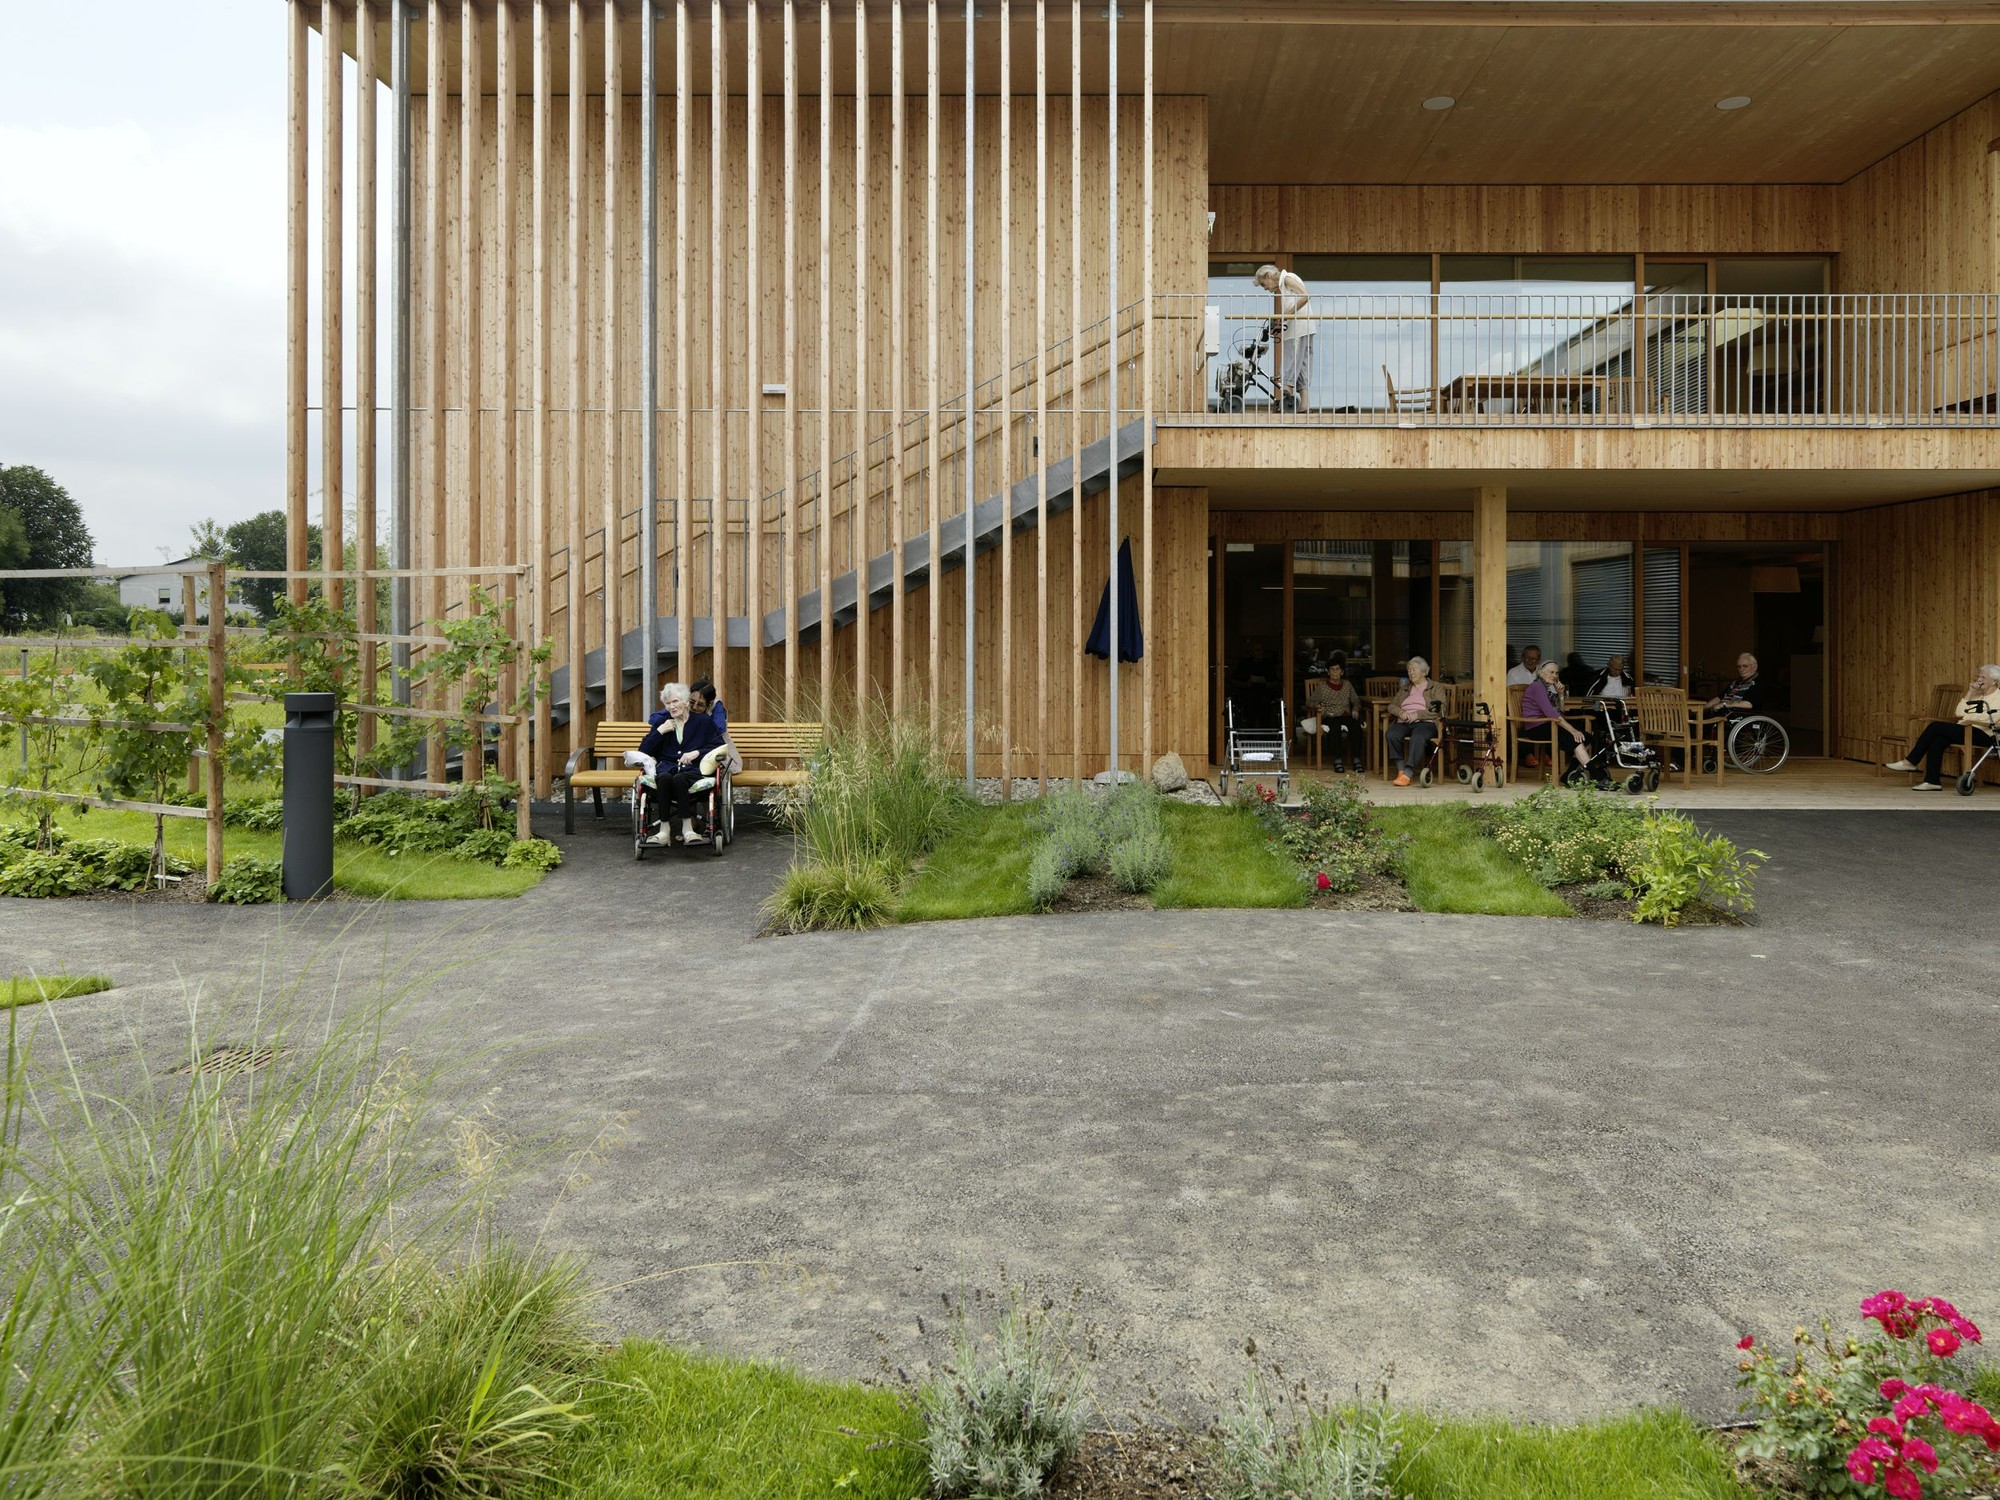 House Architecture Software Peter Rosegger Nursing Home Dietger Wissounig